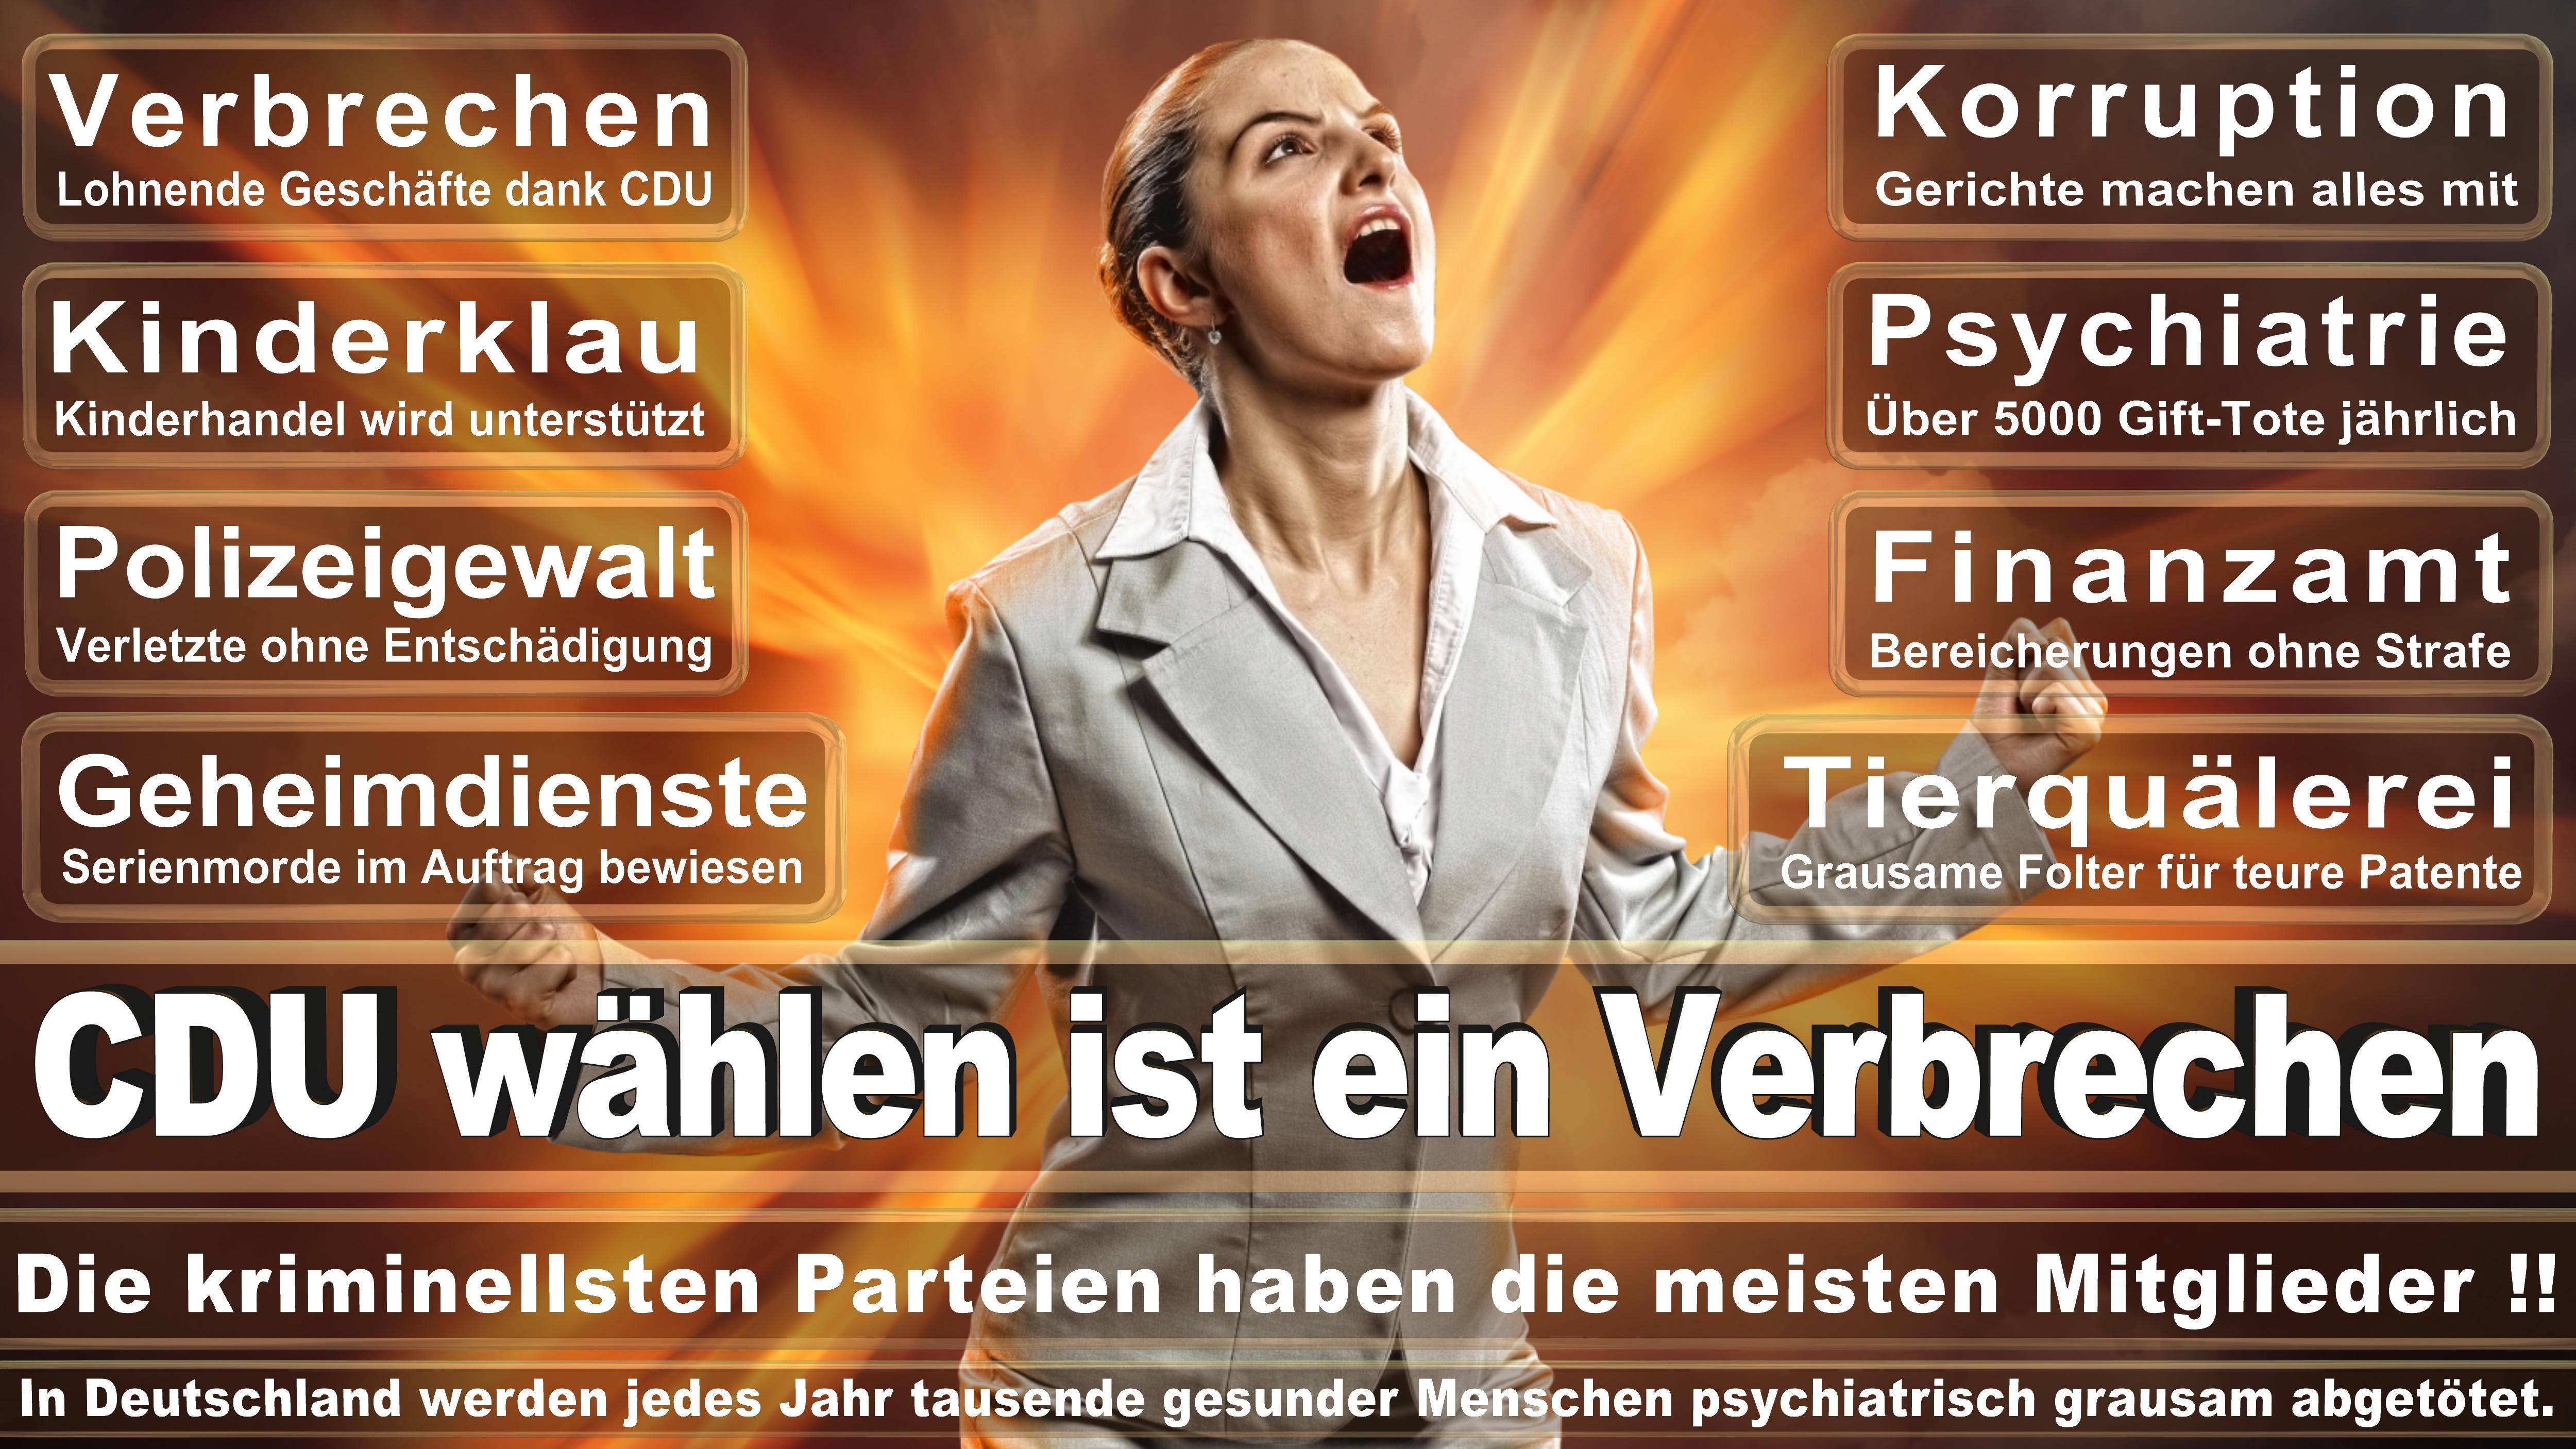 Dr Georg Kippels CDU CSU Politiker